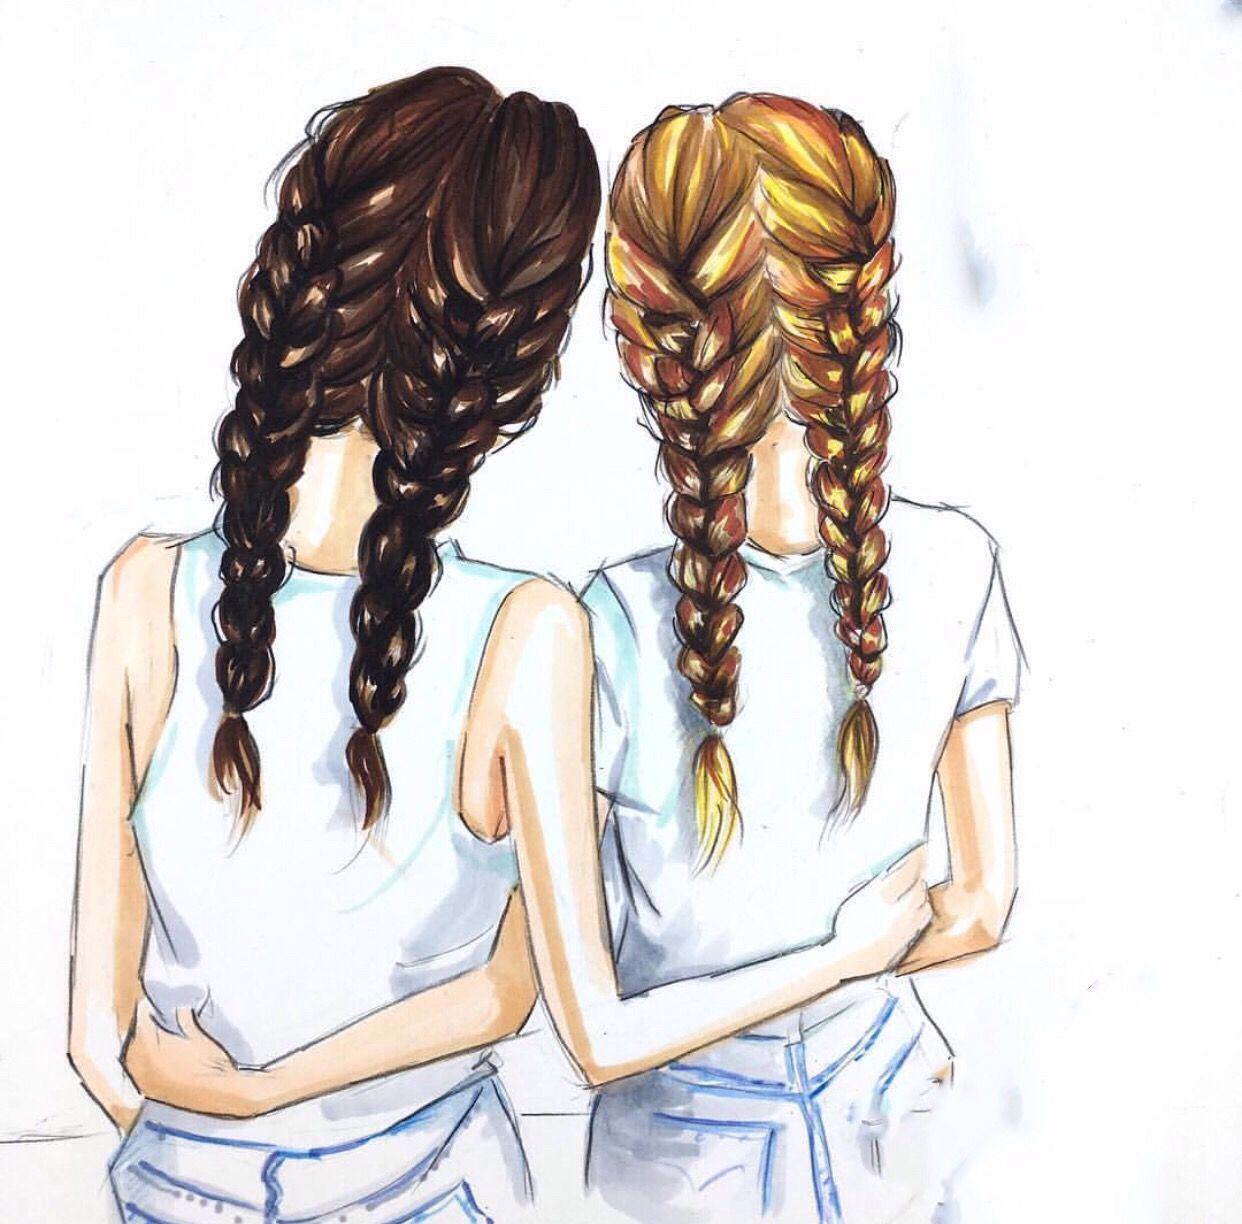 Про спортзал, картинки две подружки для срисовки